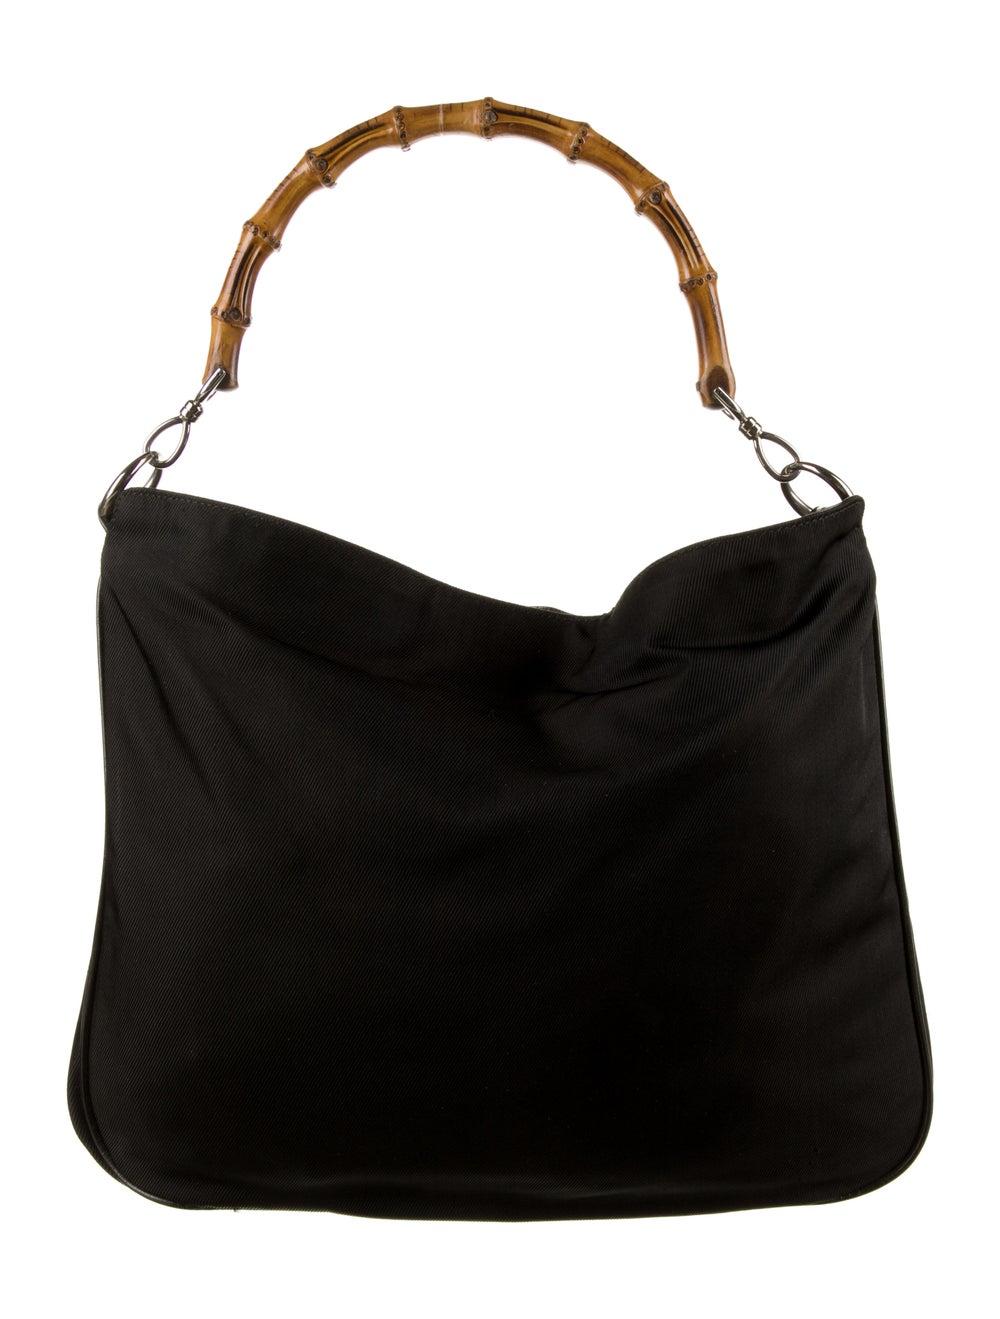 Gucci Vintage Nylon Bamboo Bag Black - image 4